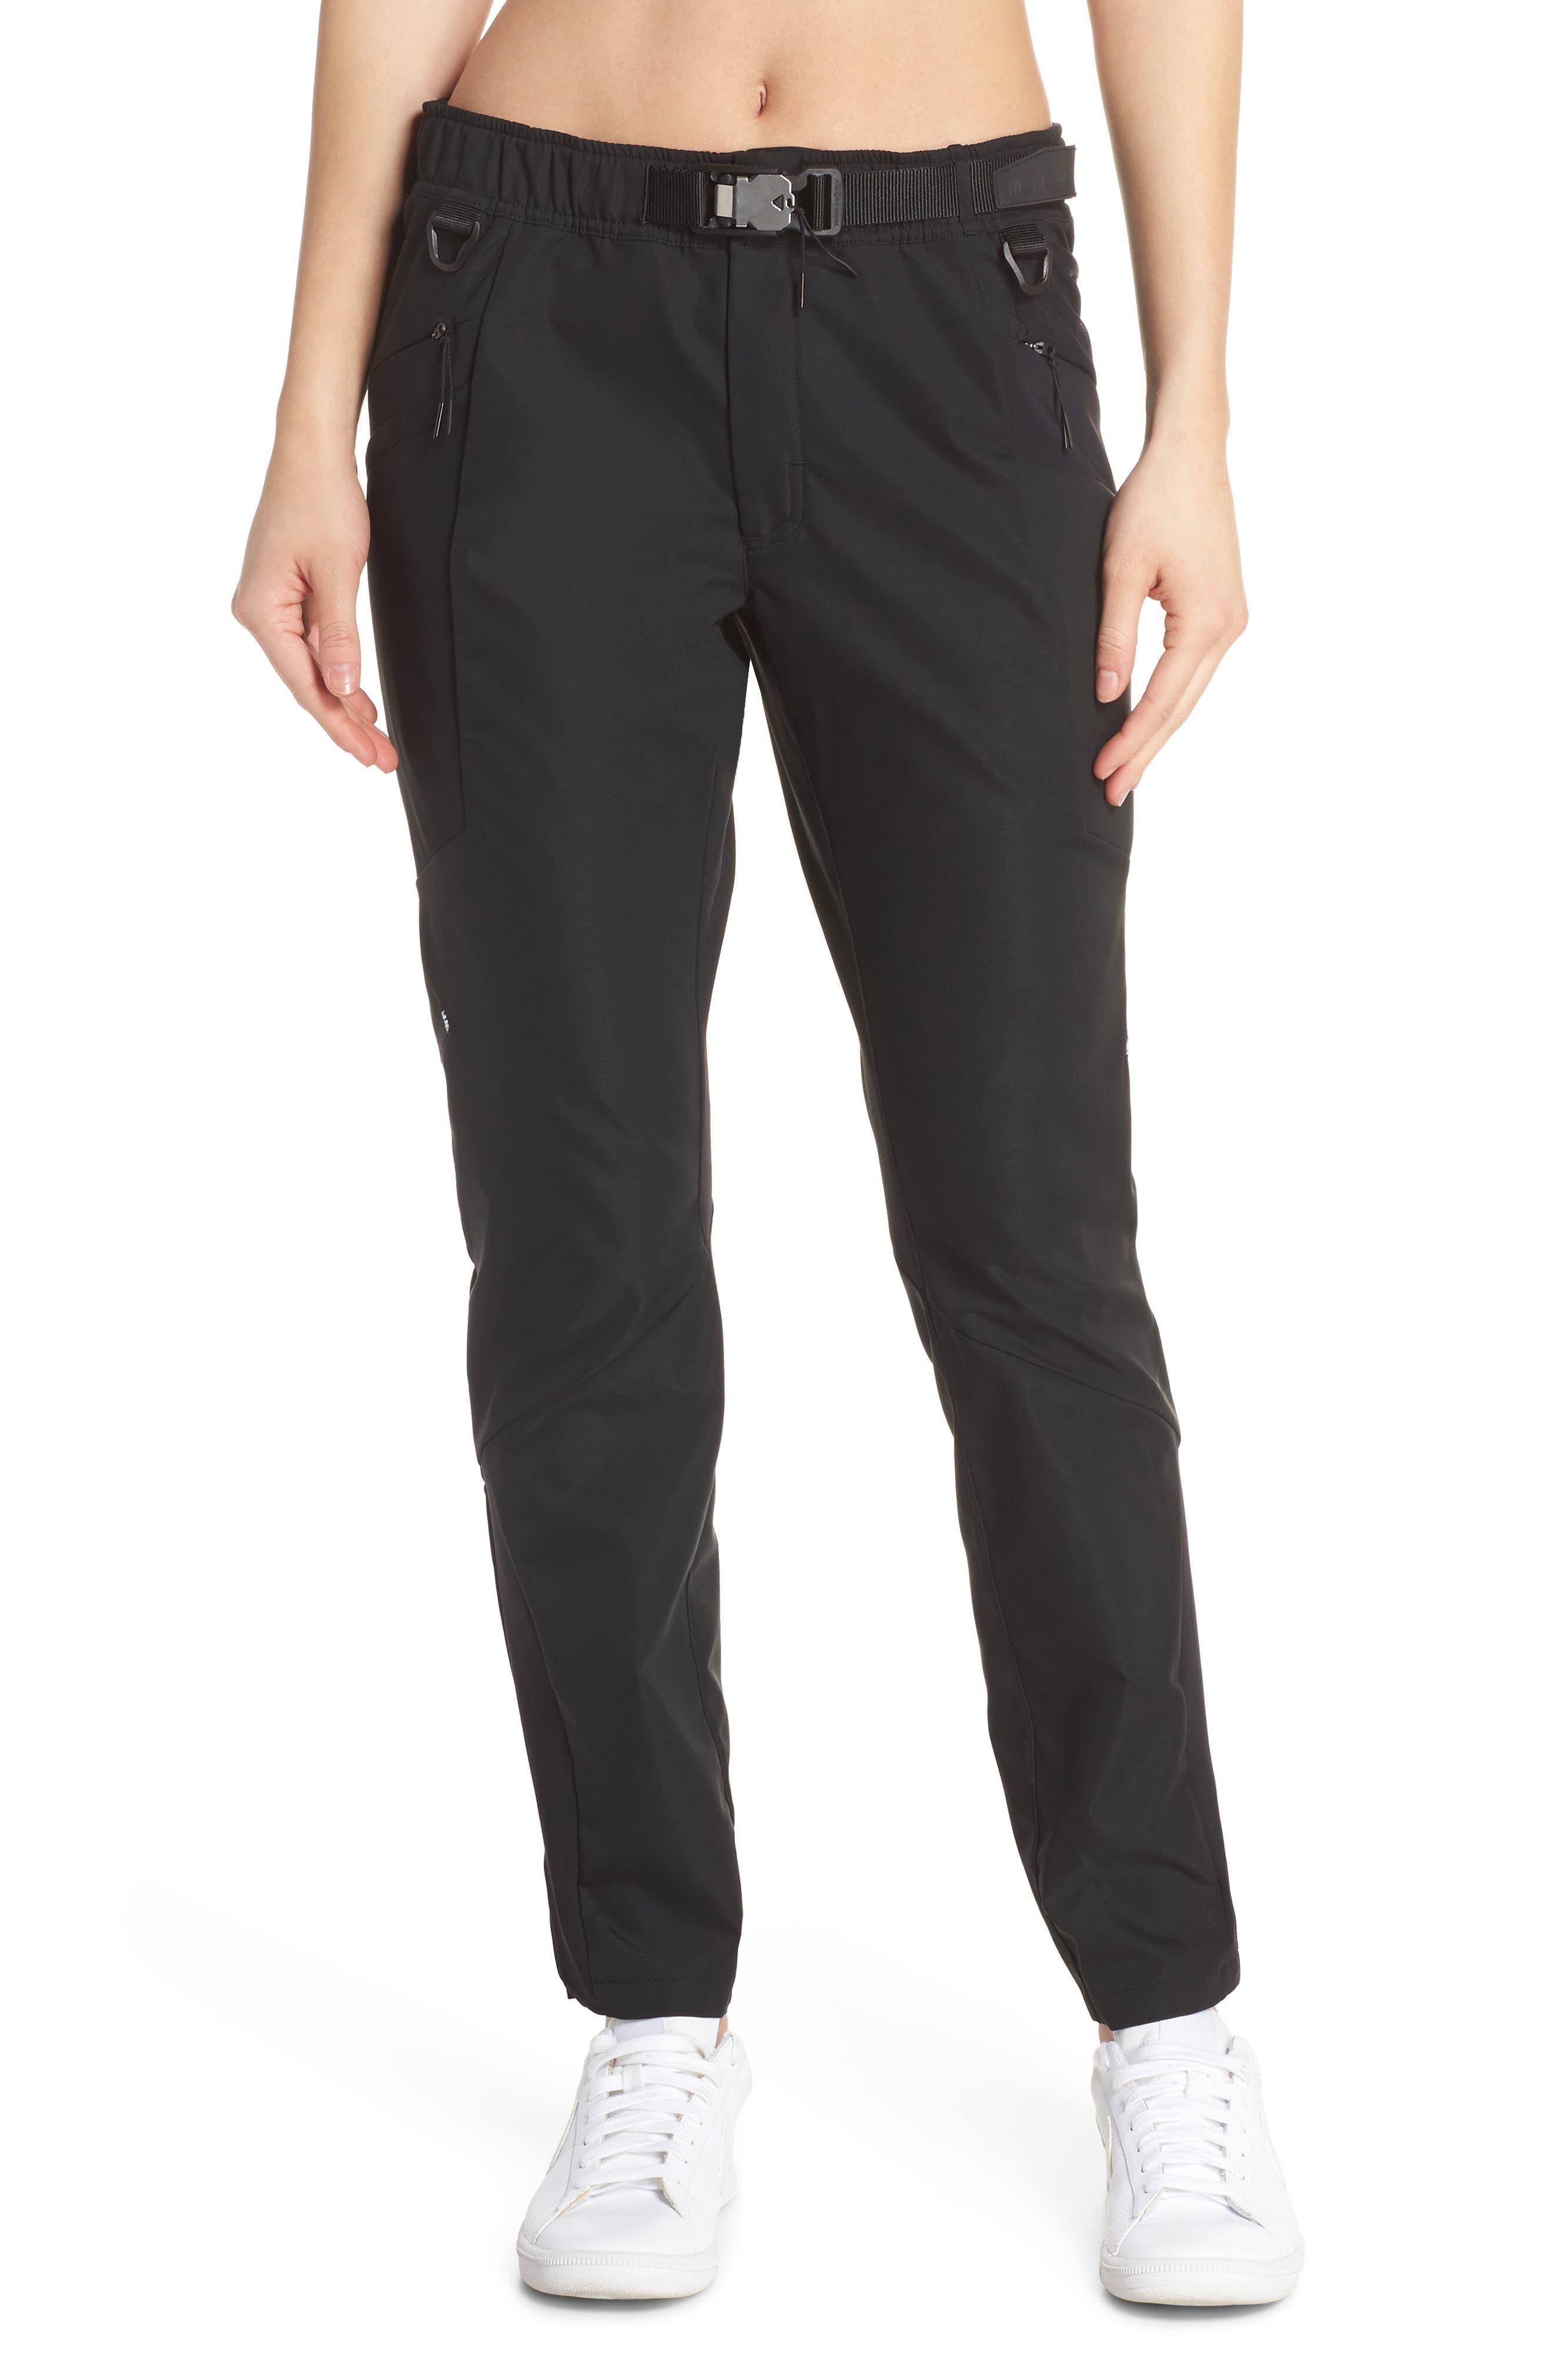 NIKE,                             NikeLab x MMW Women's Pants,                             Main thumbnail 1, color,                             010